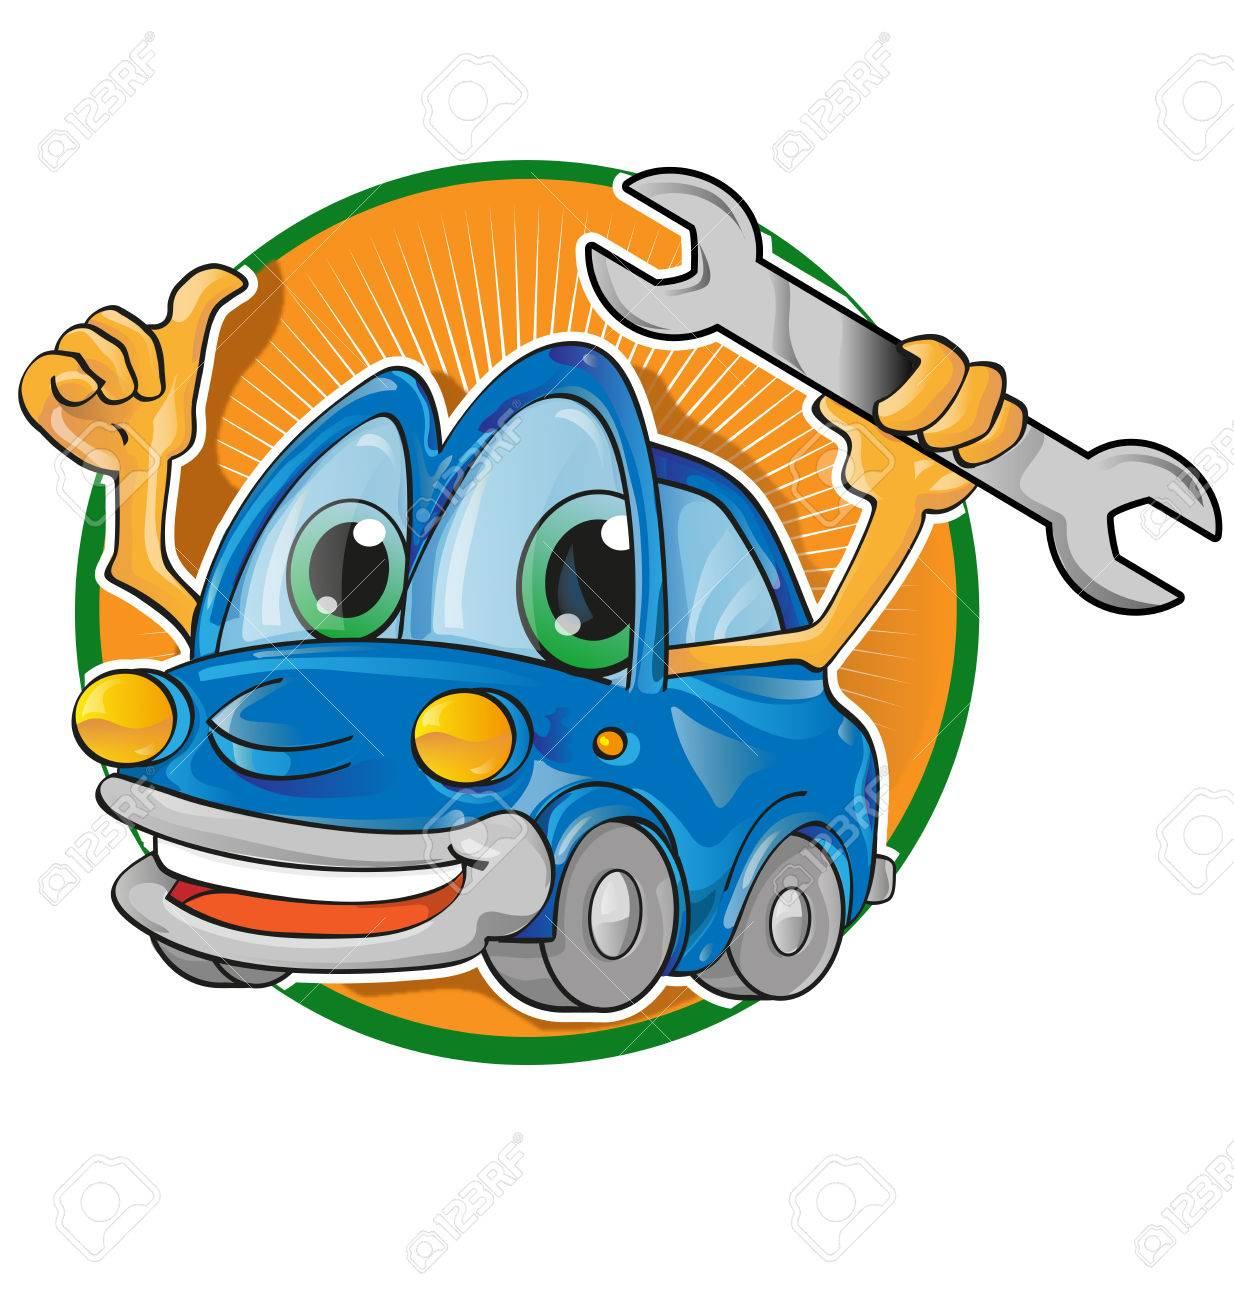 car service cartoon Stock Vector - 23858248